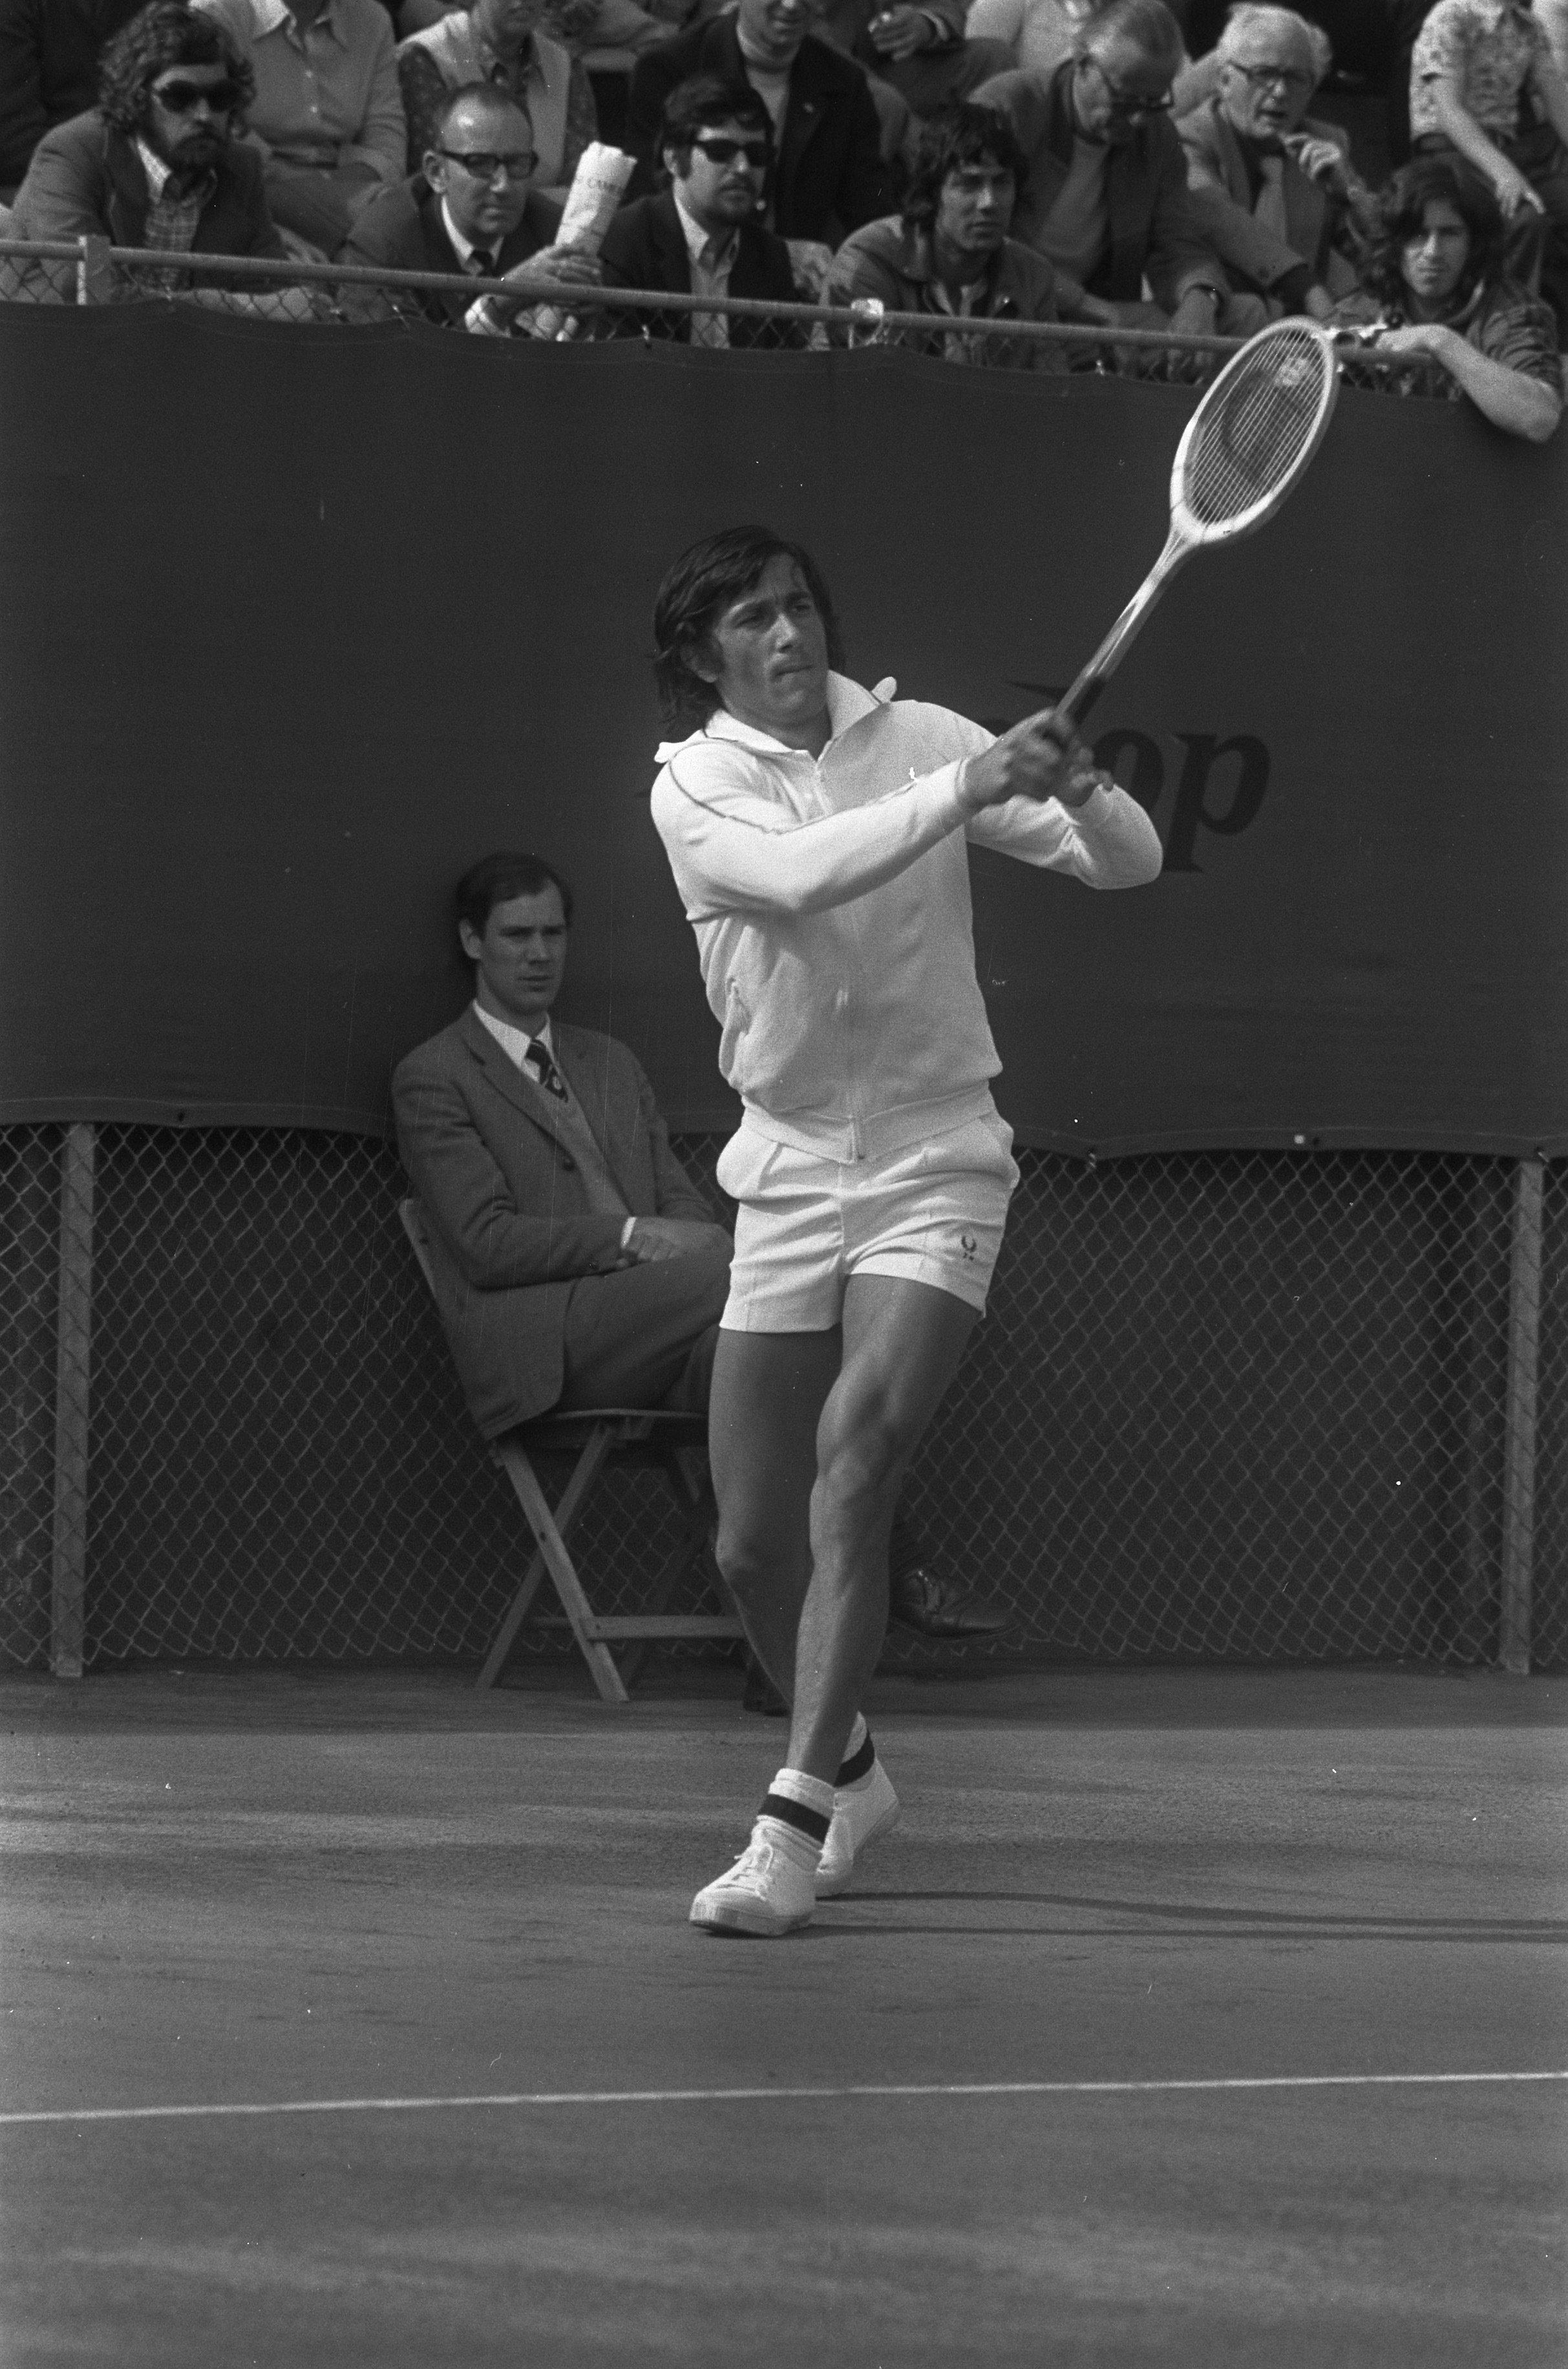 File Ilie Năstase Davis Cup Wikimedia mons